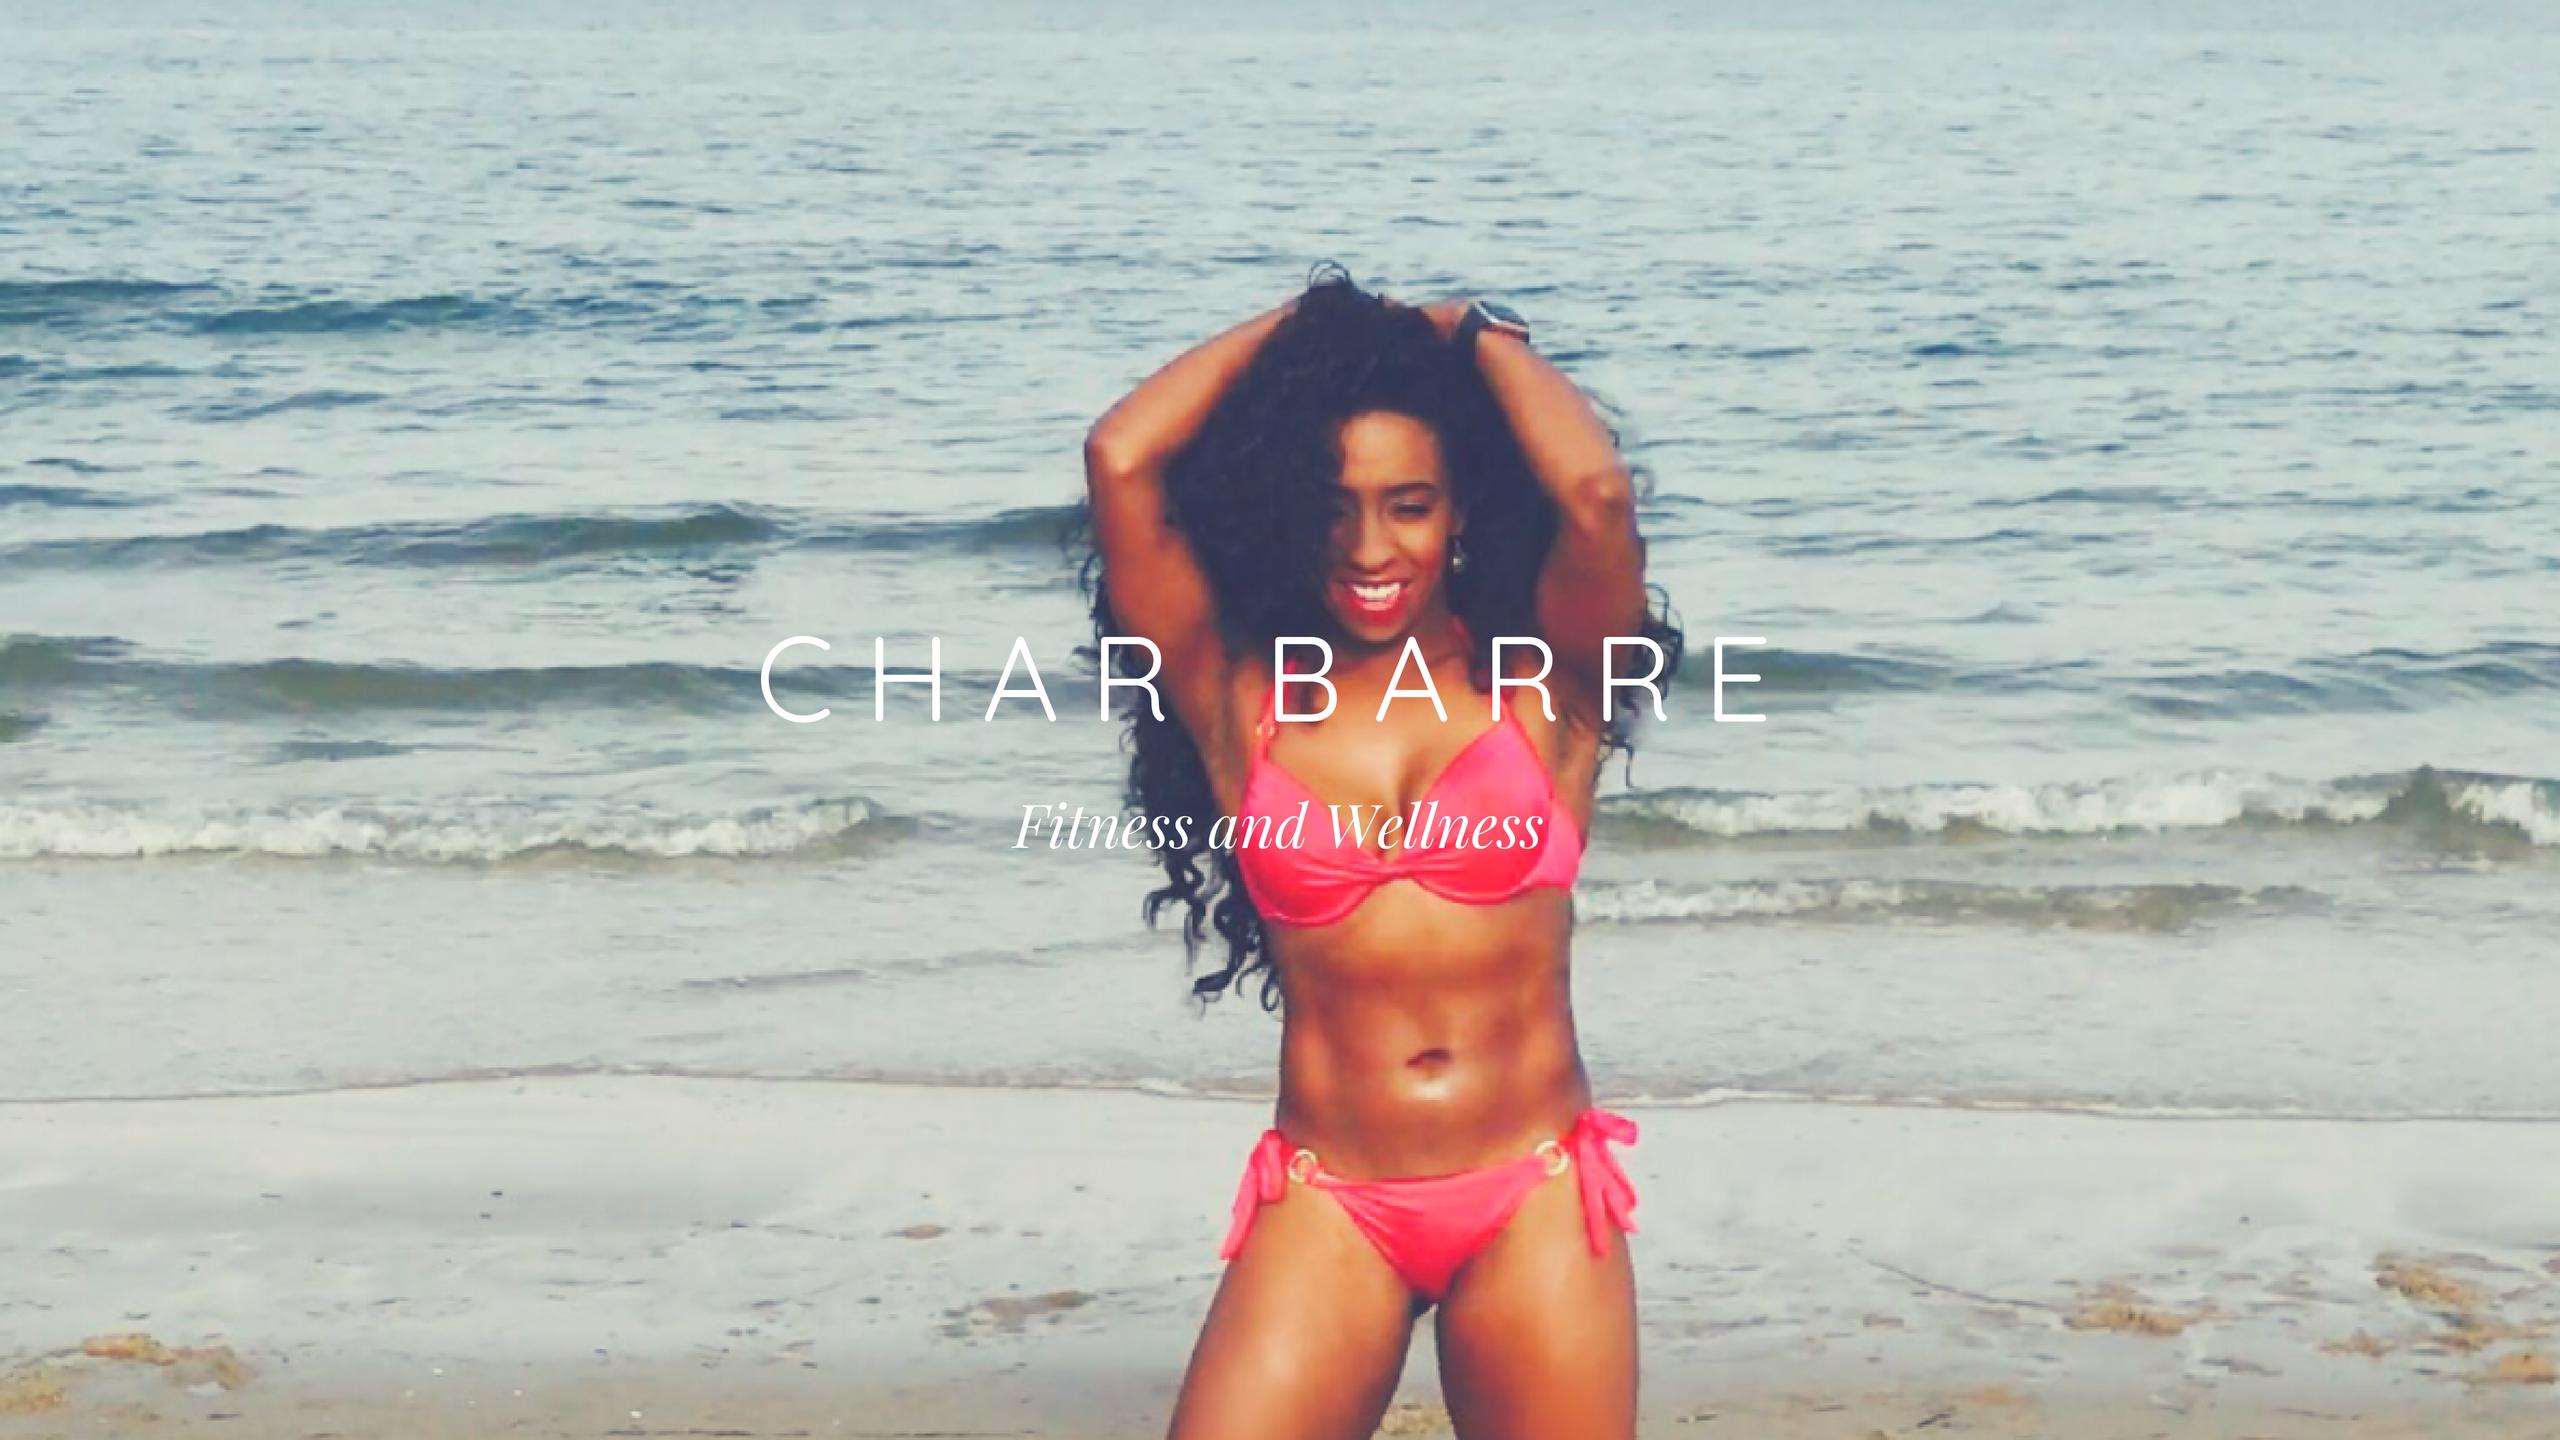 Char barre logo video header